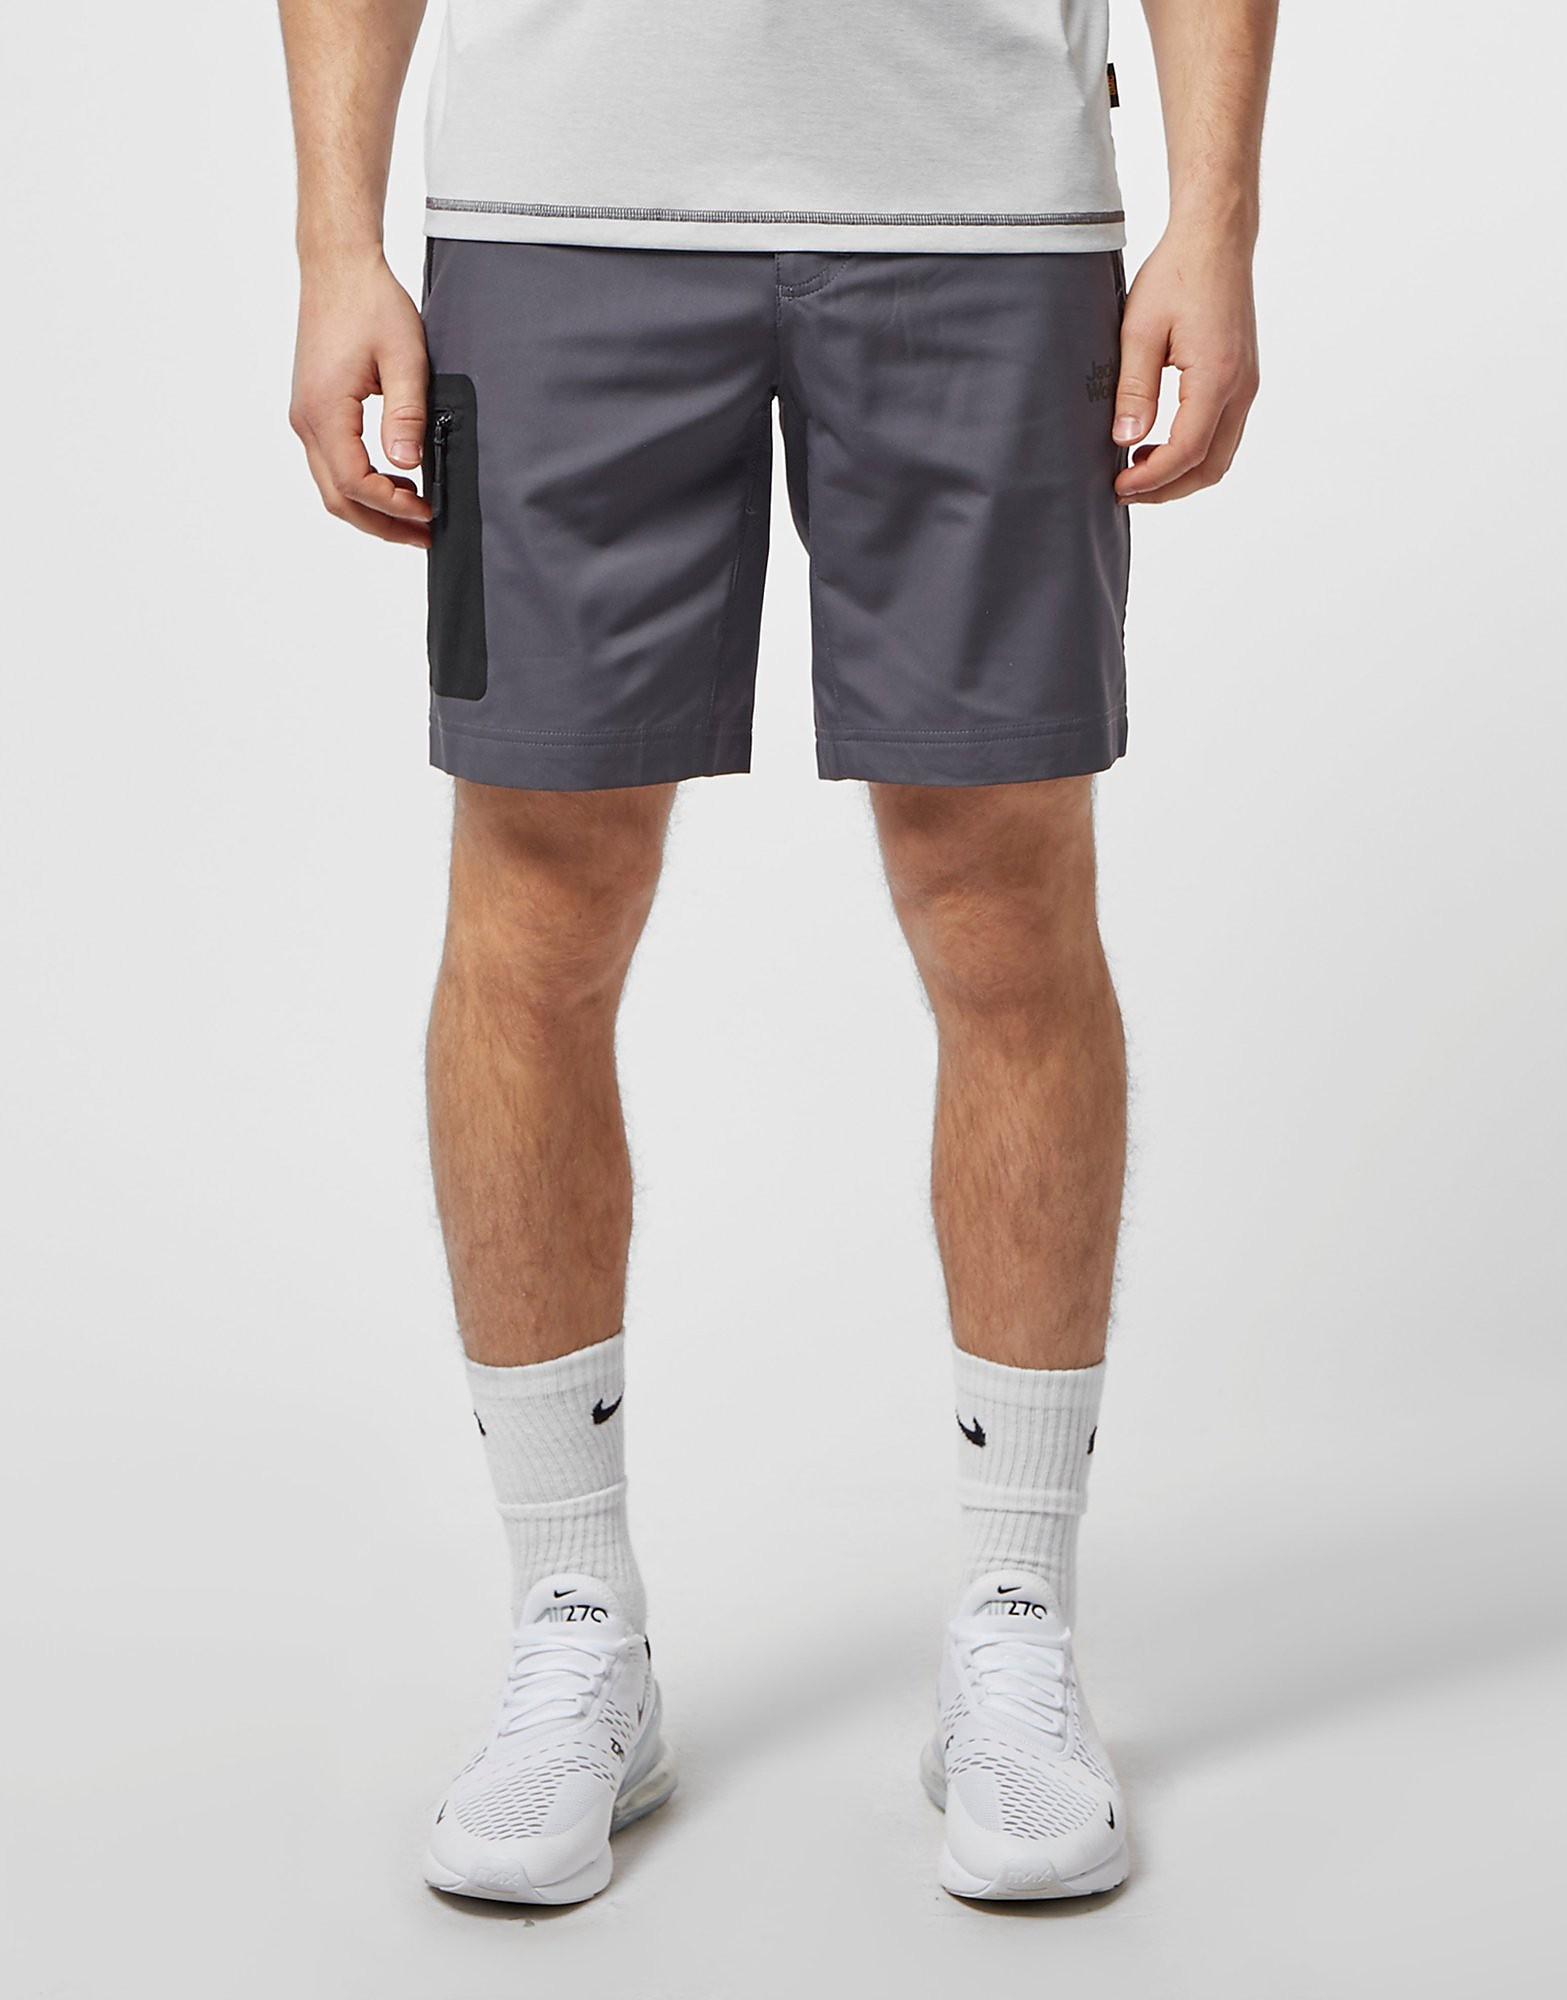 Jack Wolfskin Pocket Shorts